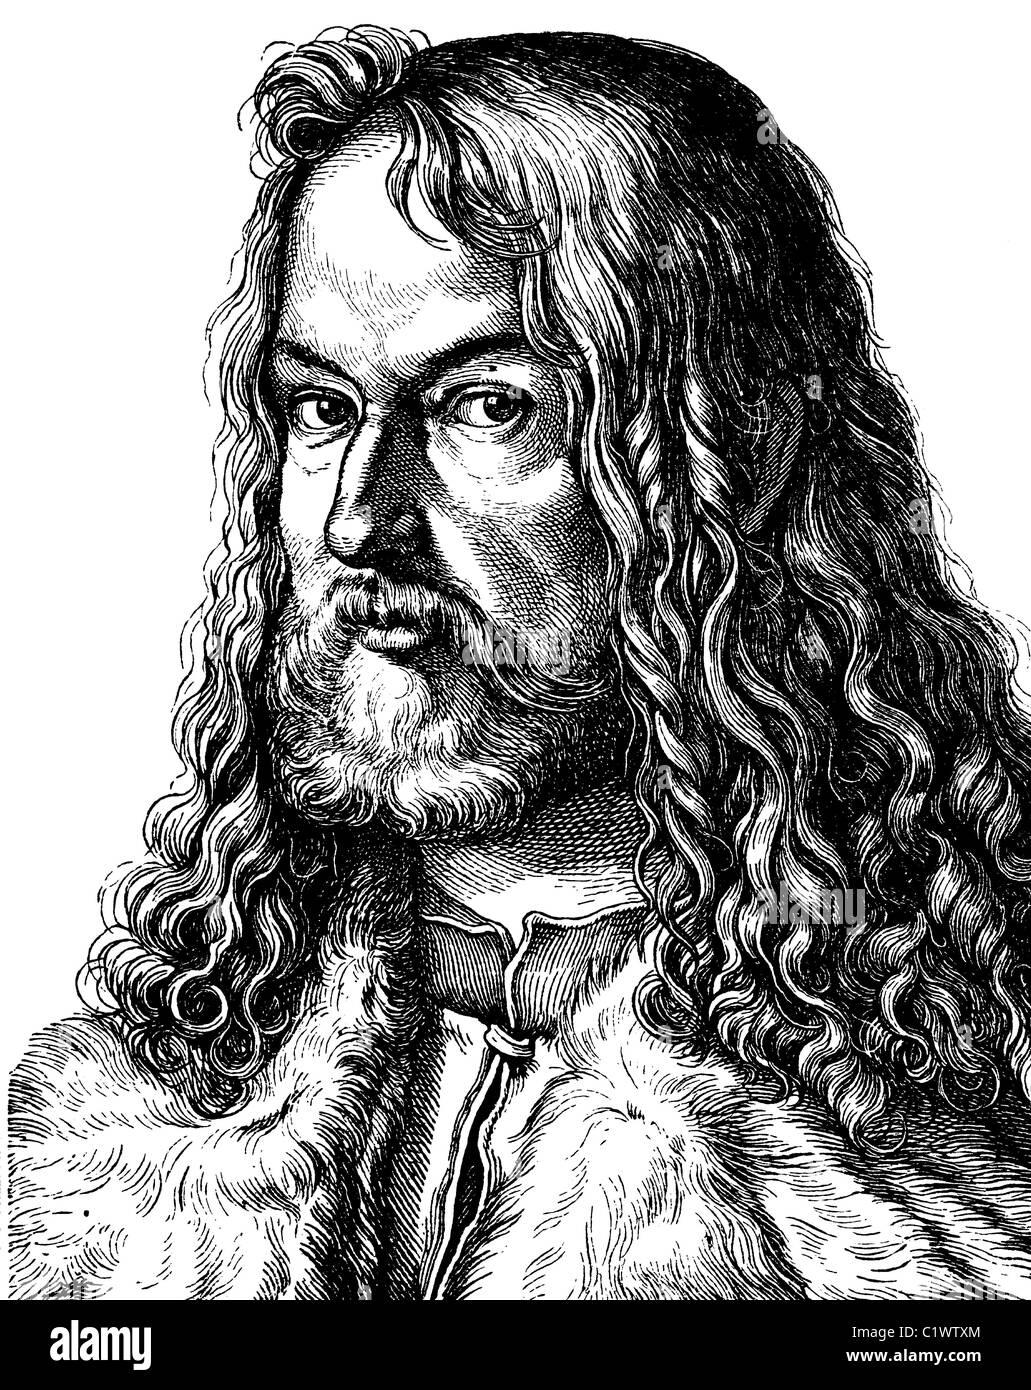 Verbesserte Digitalbild von Albrecht Duerer, Maler, 1471-1528, historische Illustration, Porträt, 1880 Stockbild